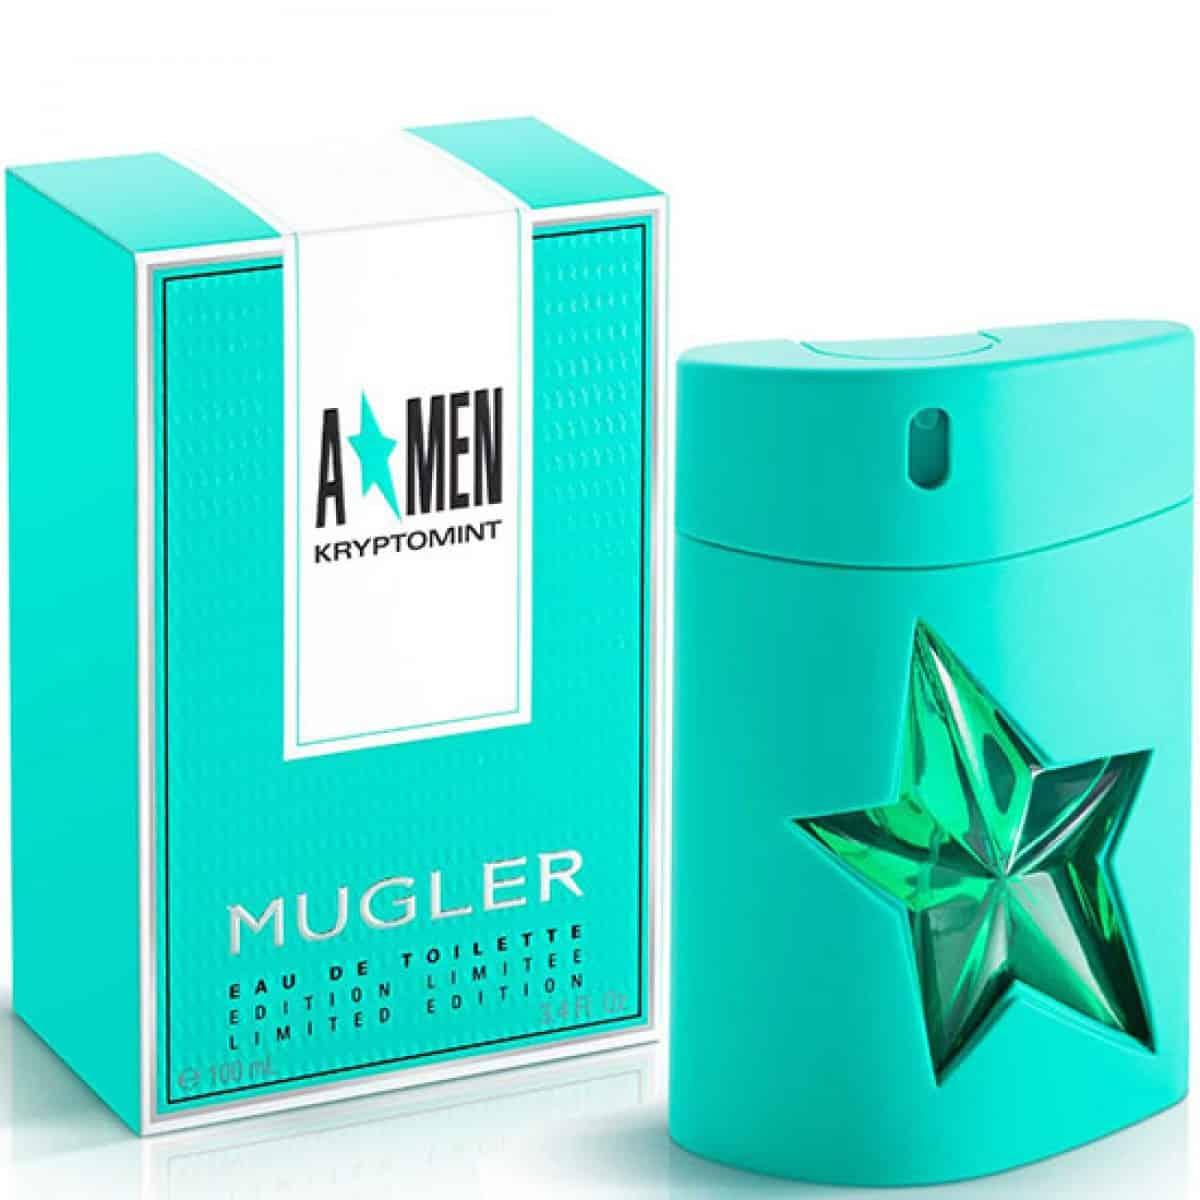 thierry mugler kryptomint edt 100ml perfume for men - ادو تویلت مردانه تیری ماگلر مدل Kryptomint حجم 100 میلی لیتر